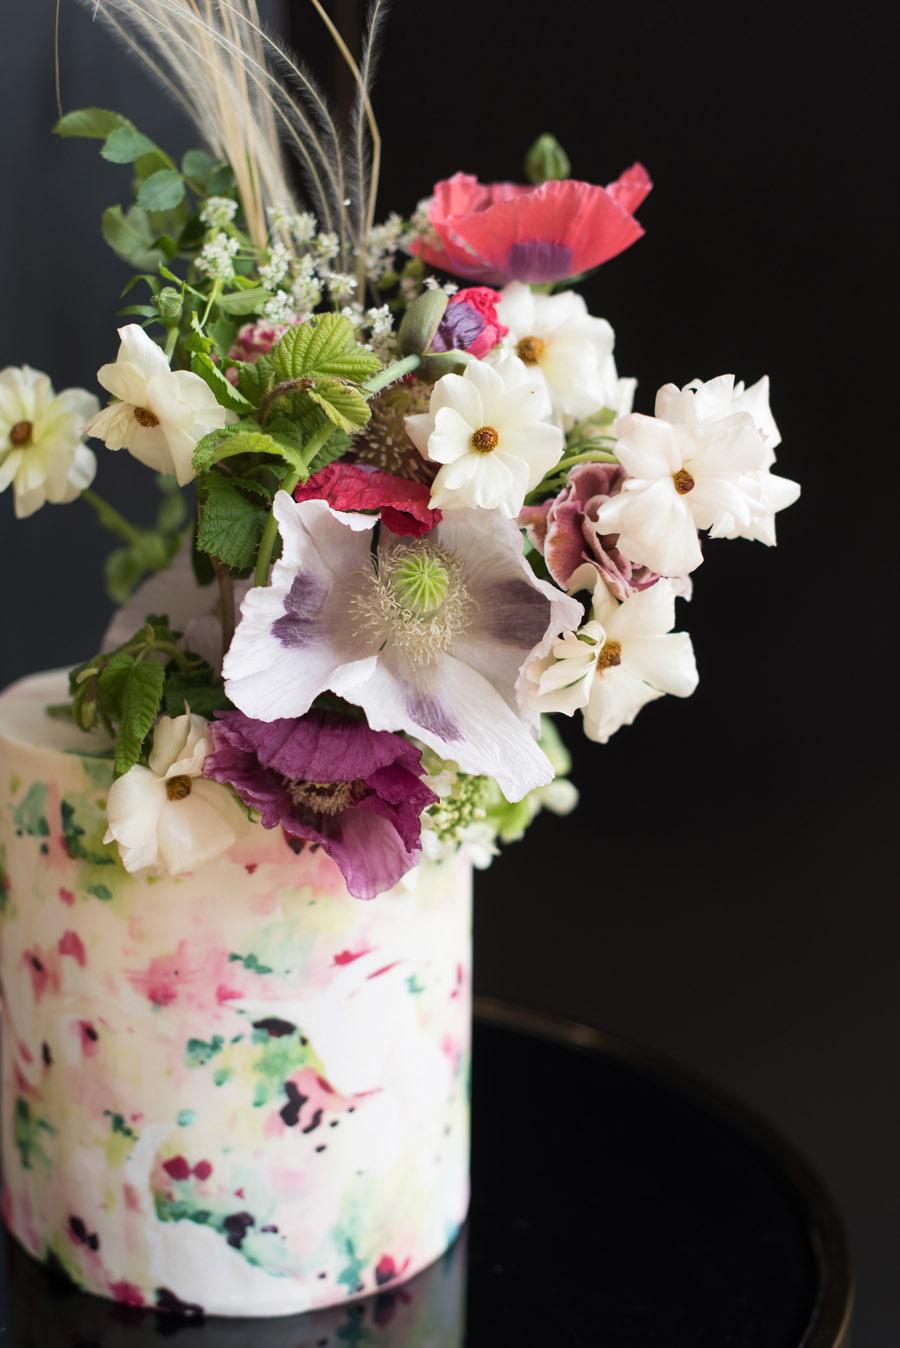 floral wedding ideas at Millbridge Court on English Wedding - photo credit Julie Michaelsen Photography (34)